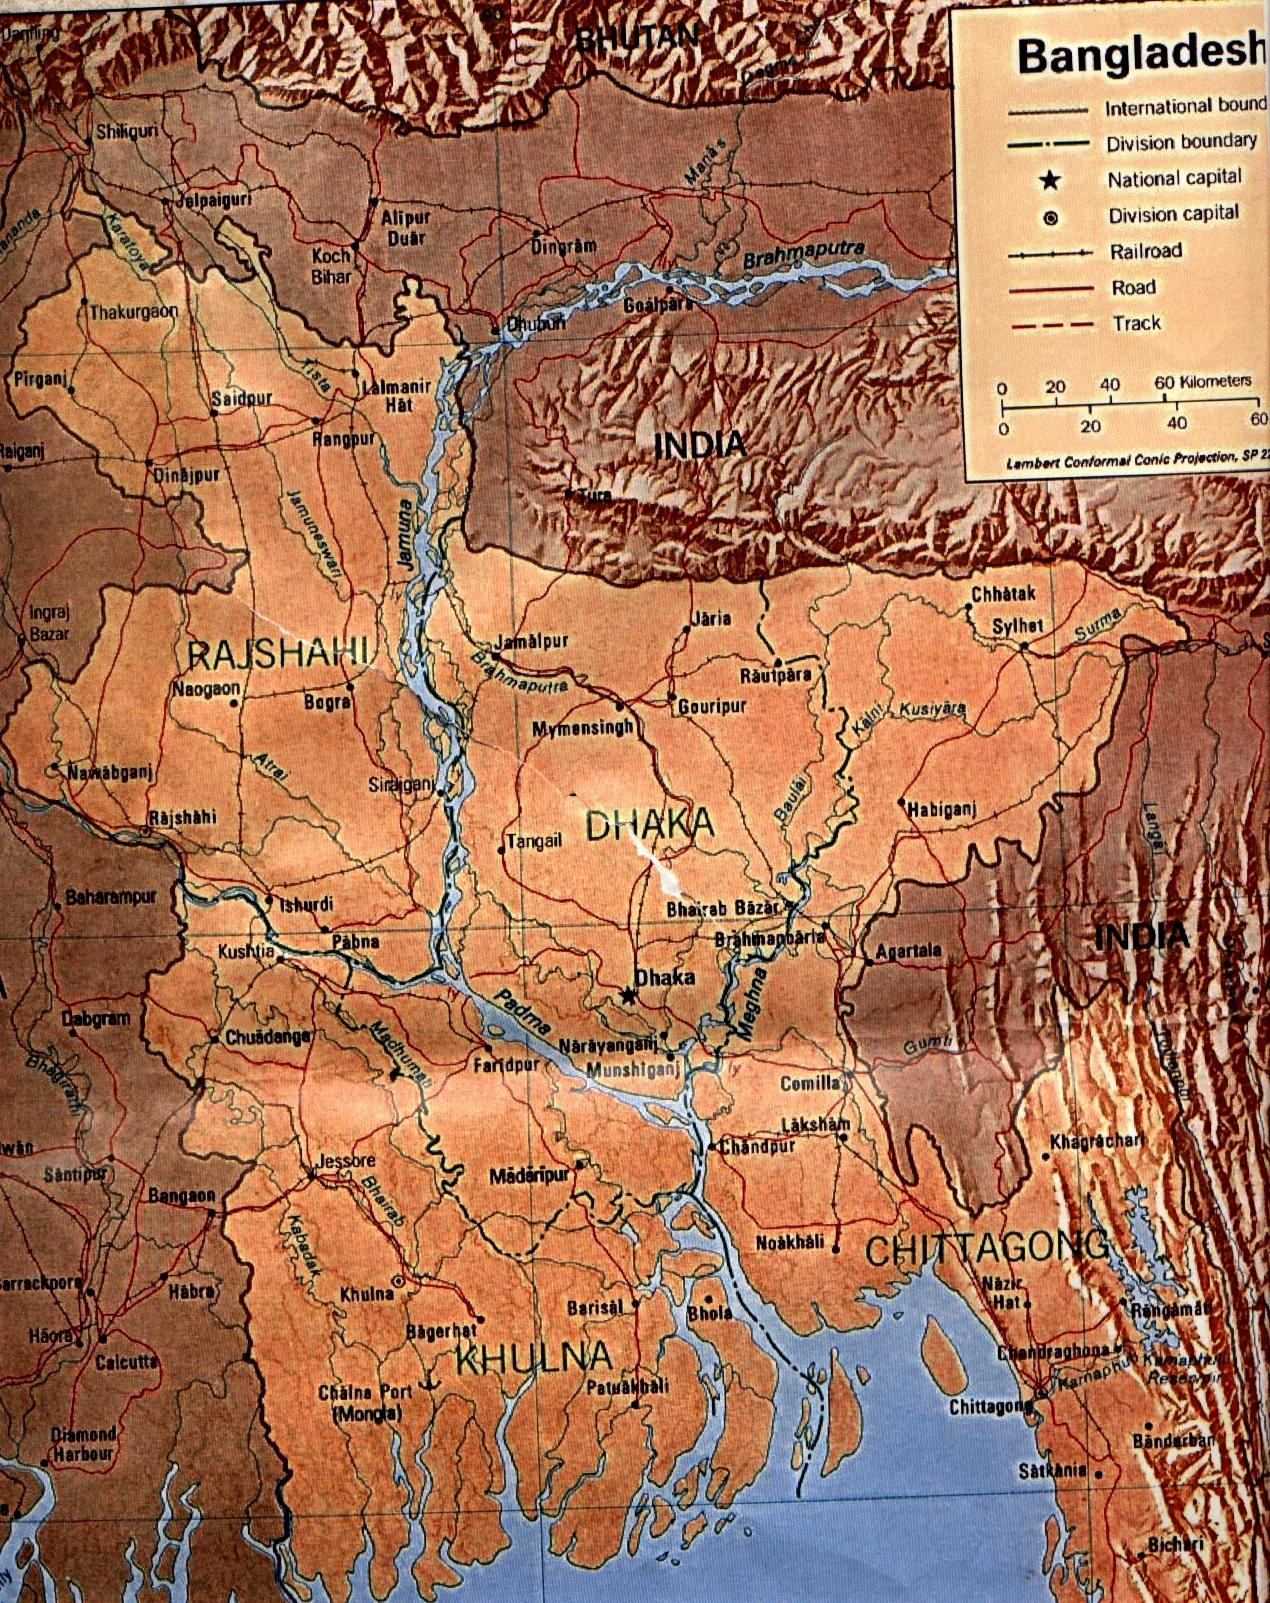 Bangladesh Map Bangladesh Mappery